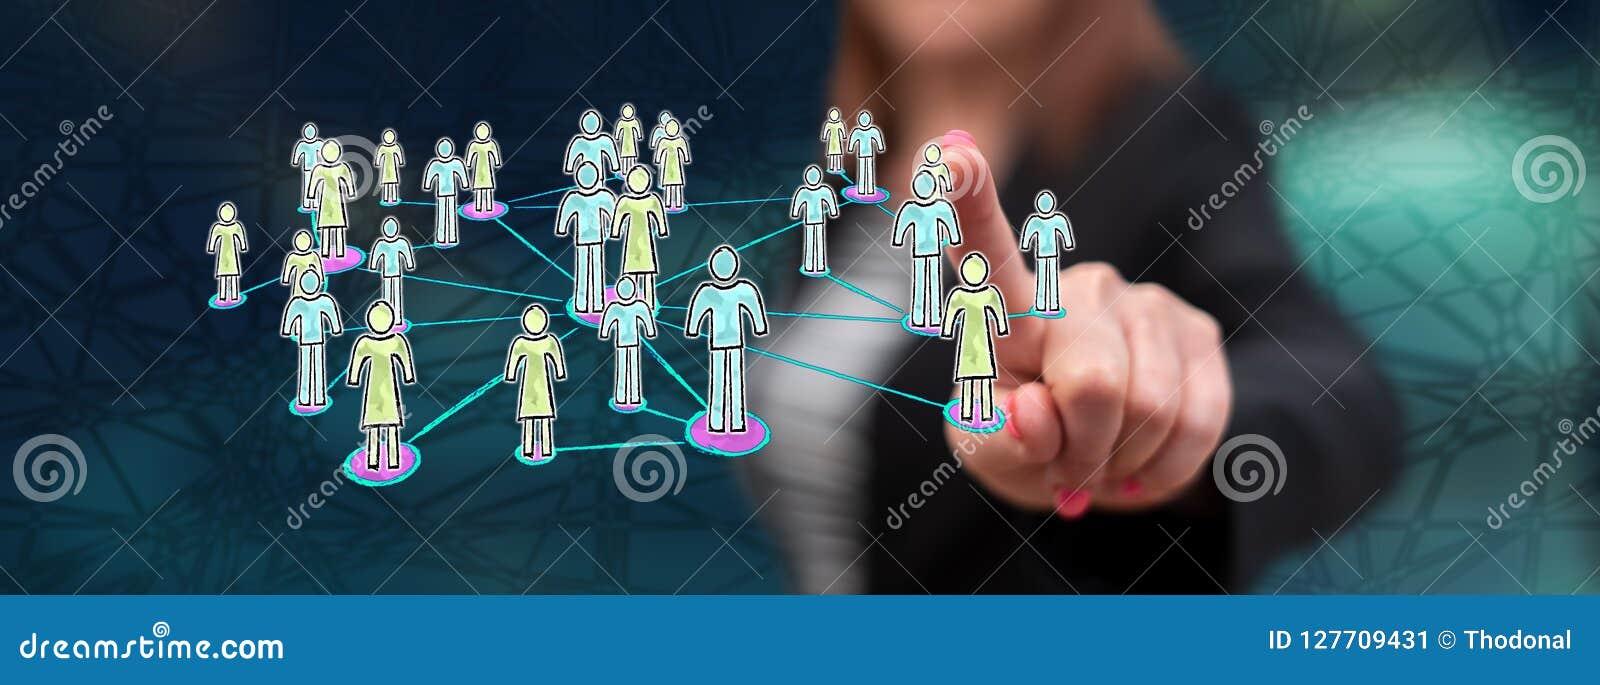 El burgo de osma dating websites